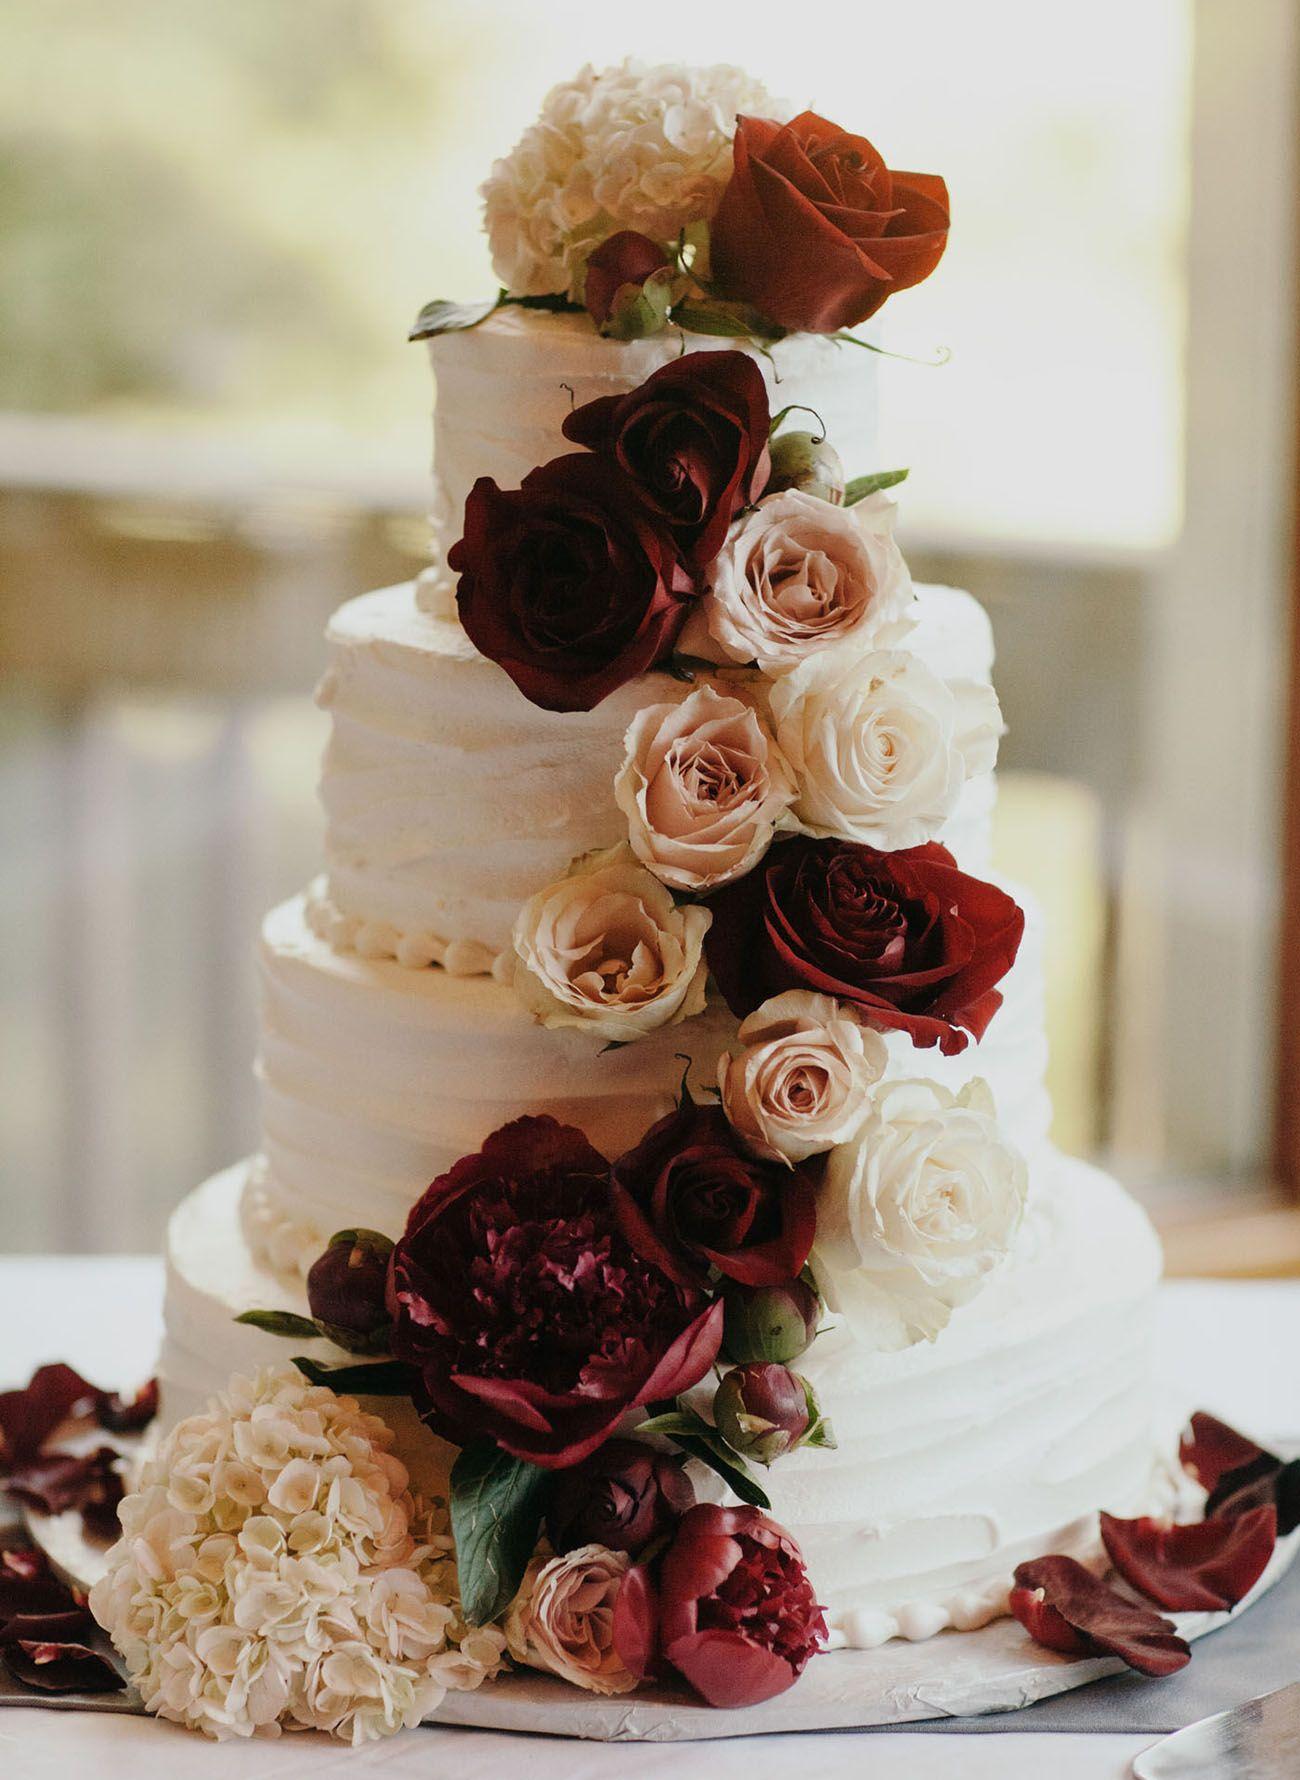 Burgundy + Cream Rustic Chic Texas Wedding Ruffles, Rose